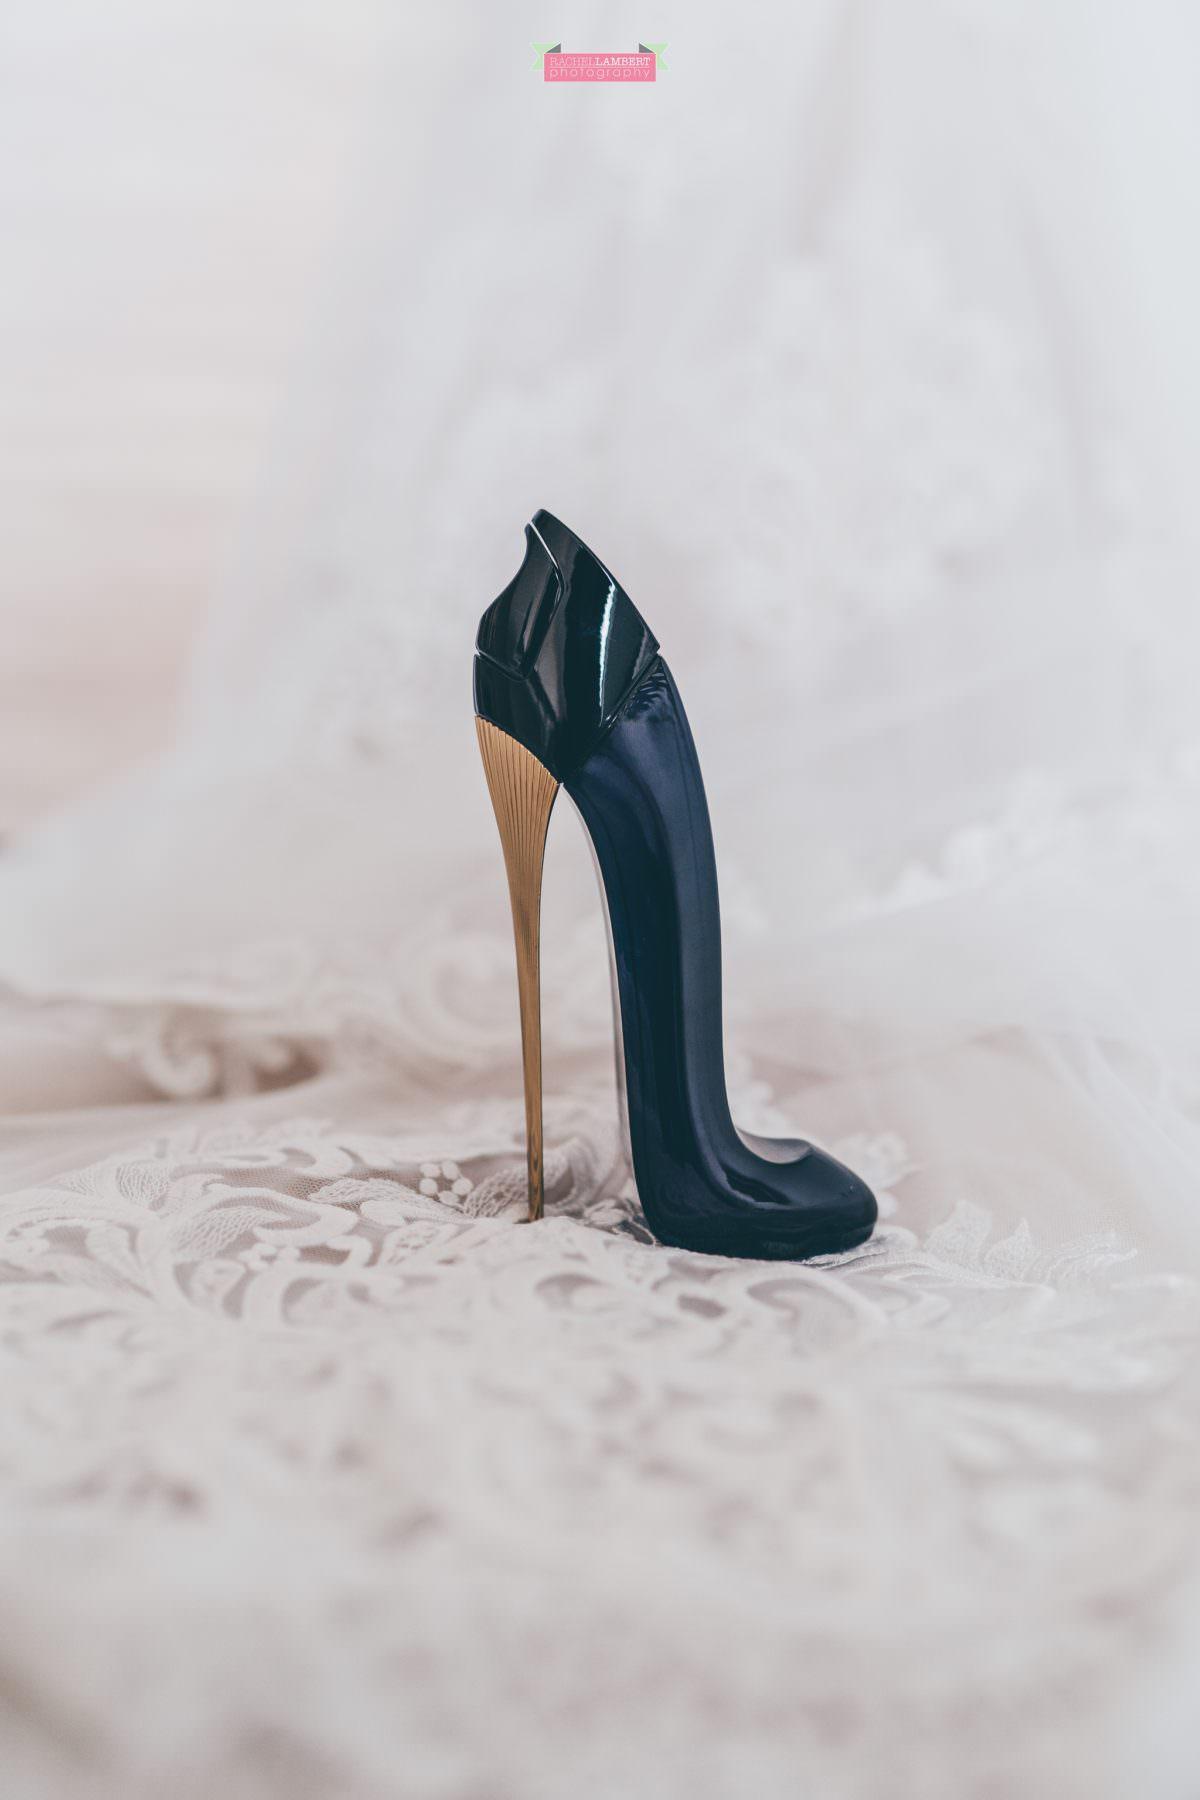 cardiff wedding photographer rachel lambert photography llanerch vineyard